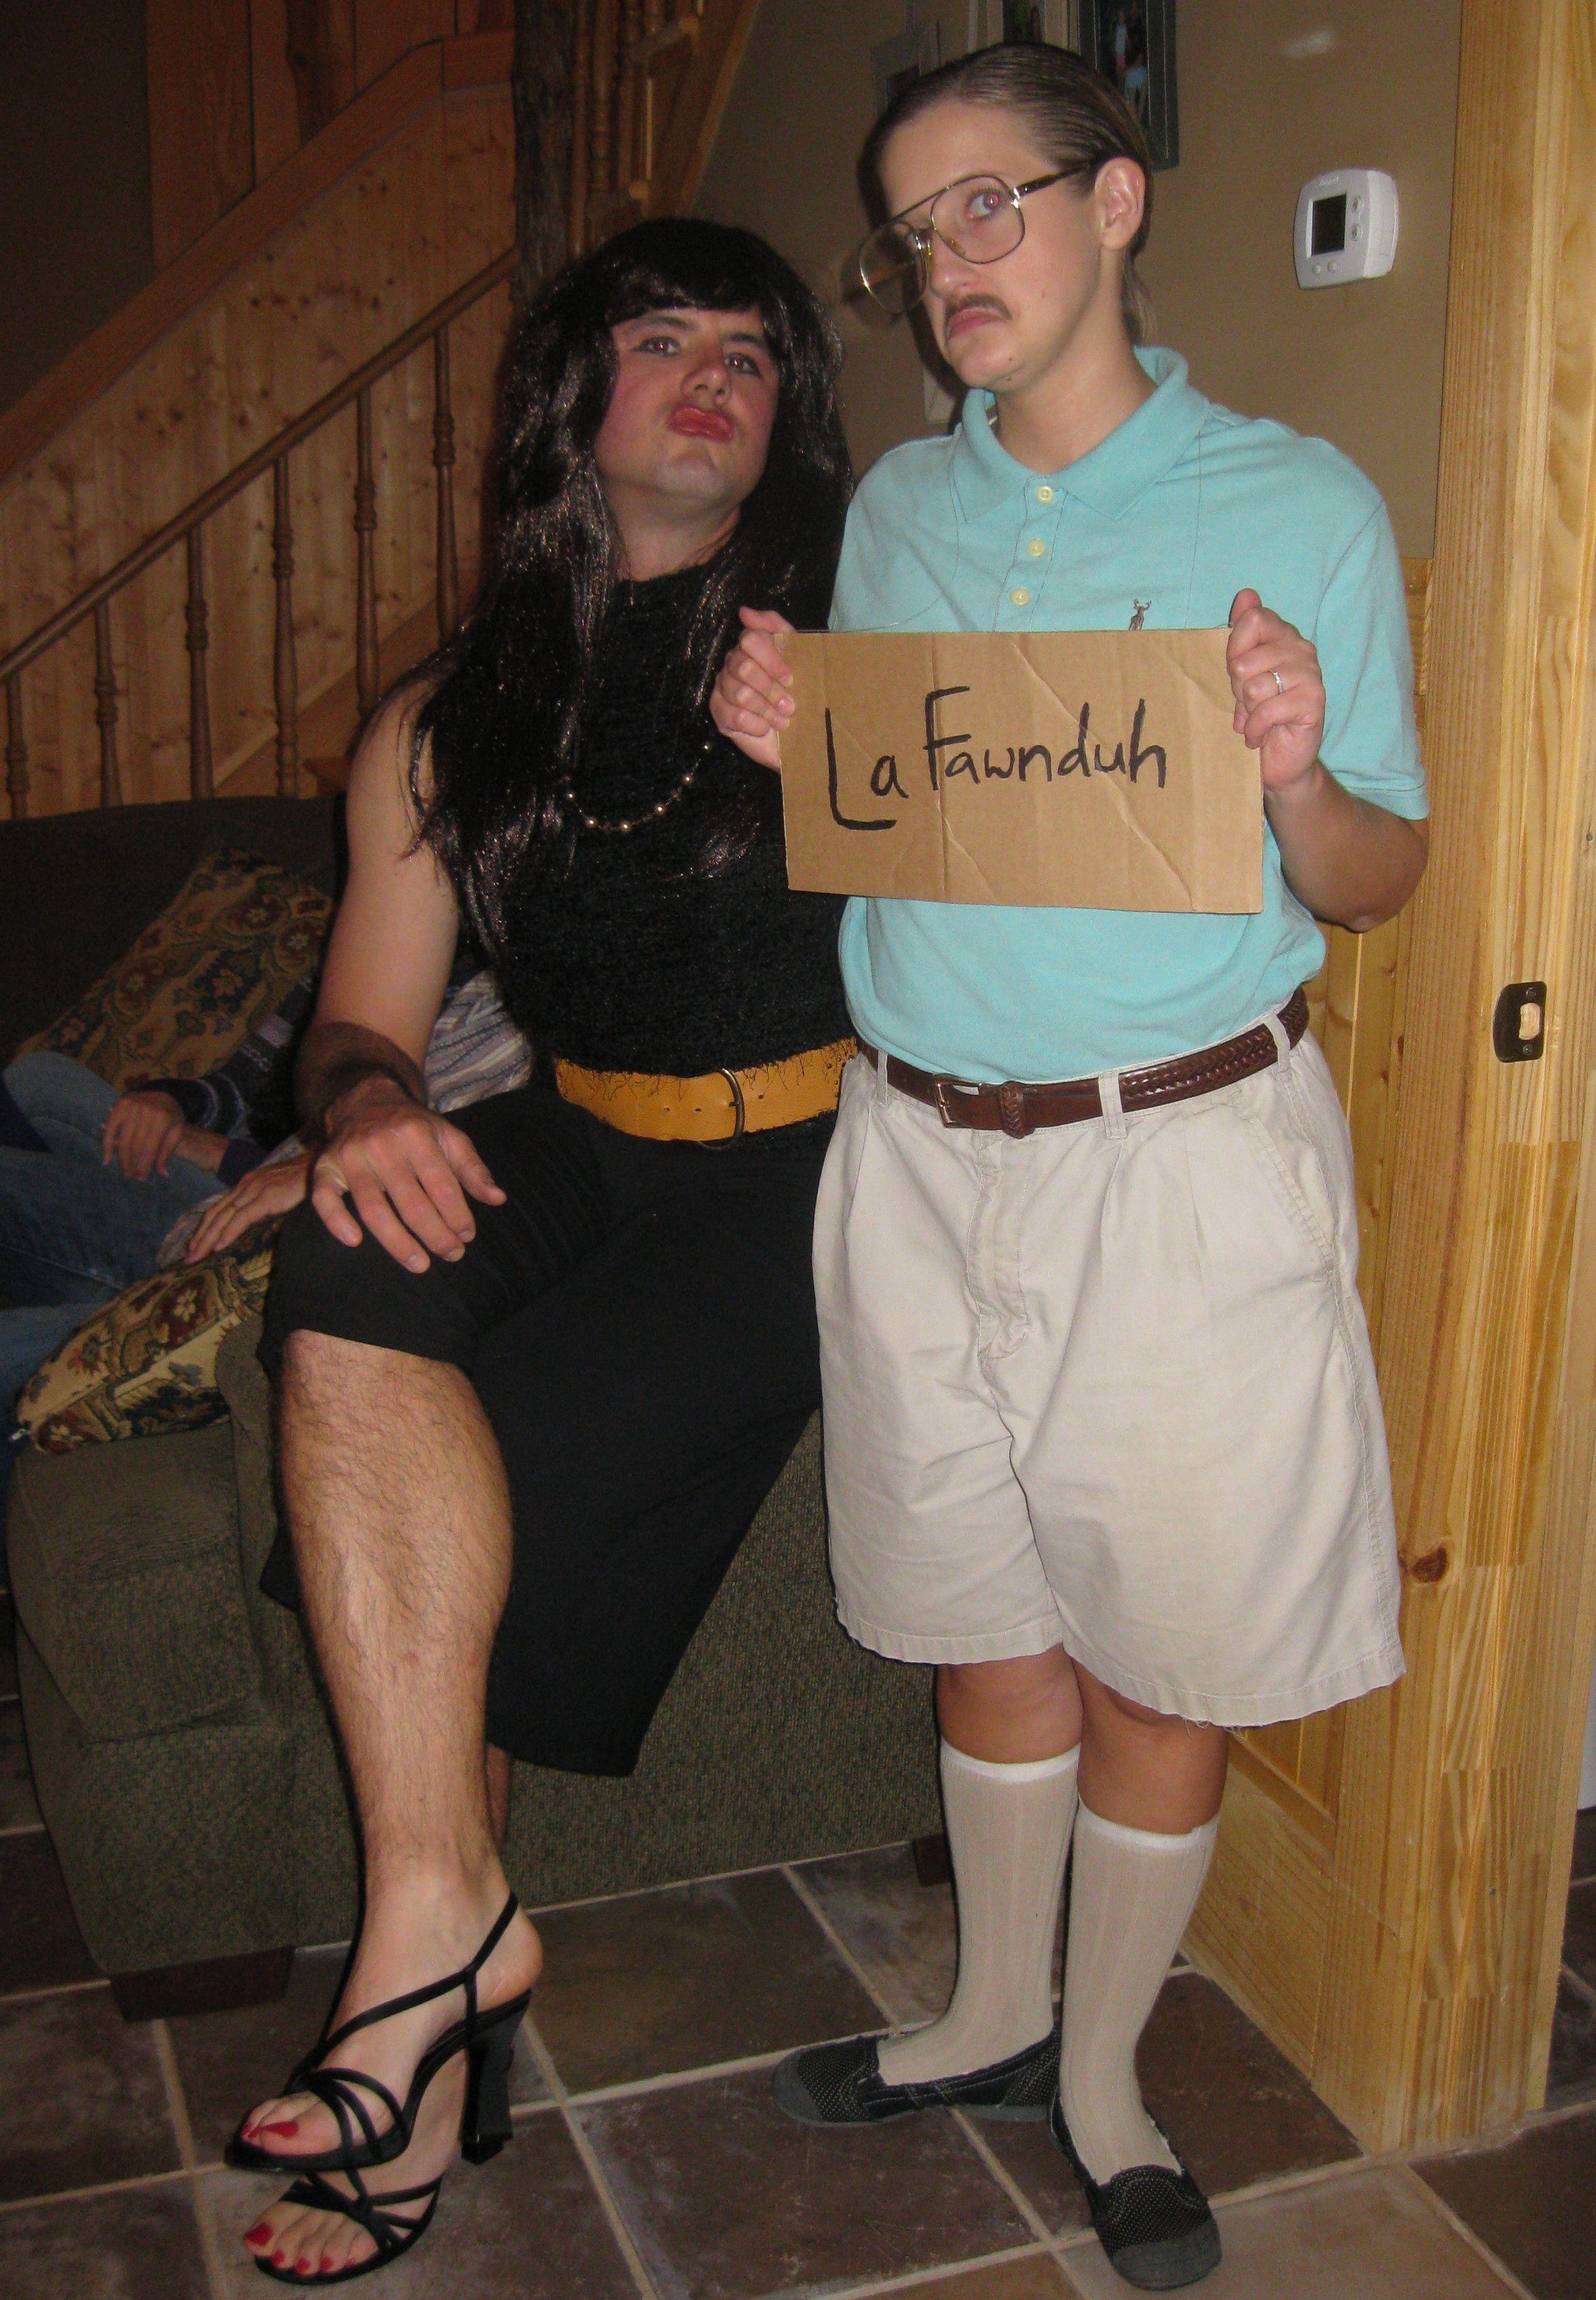 Funny Halloween Costume: Kip and LaFawnduh from Napoleon Dynamite ...